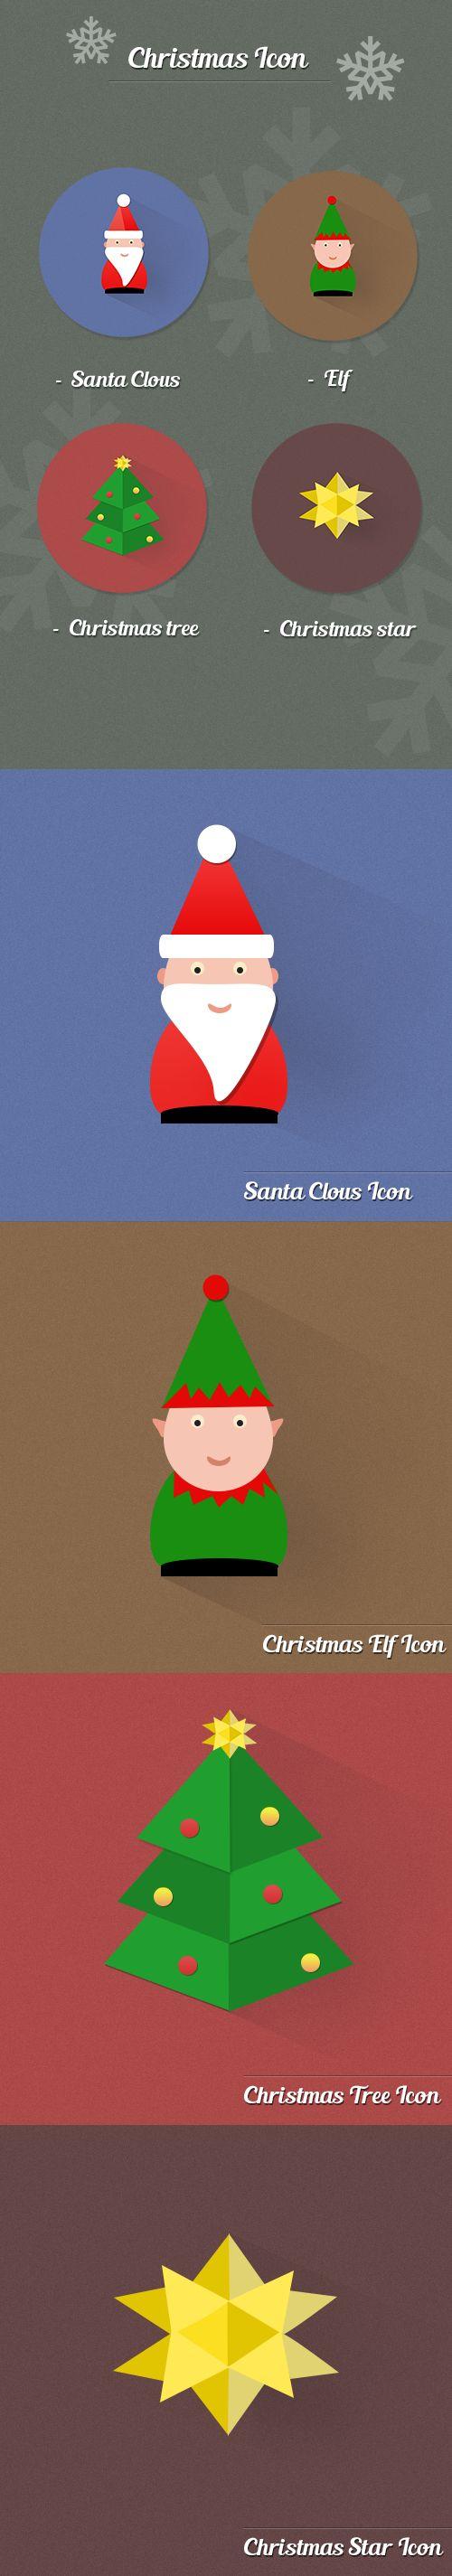 Christmas Icon (Free) on Behance